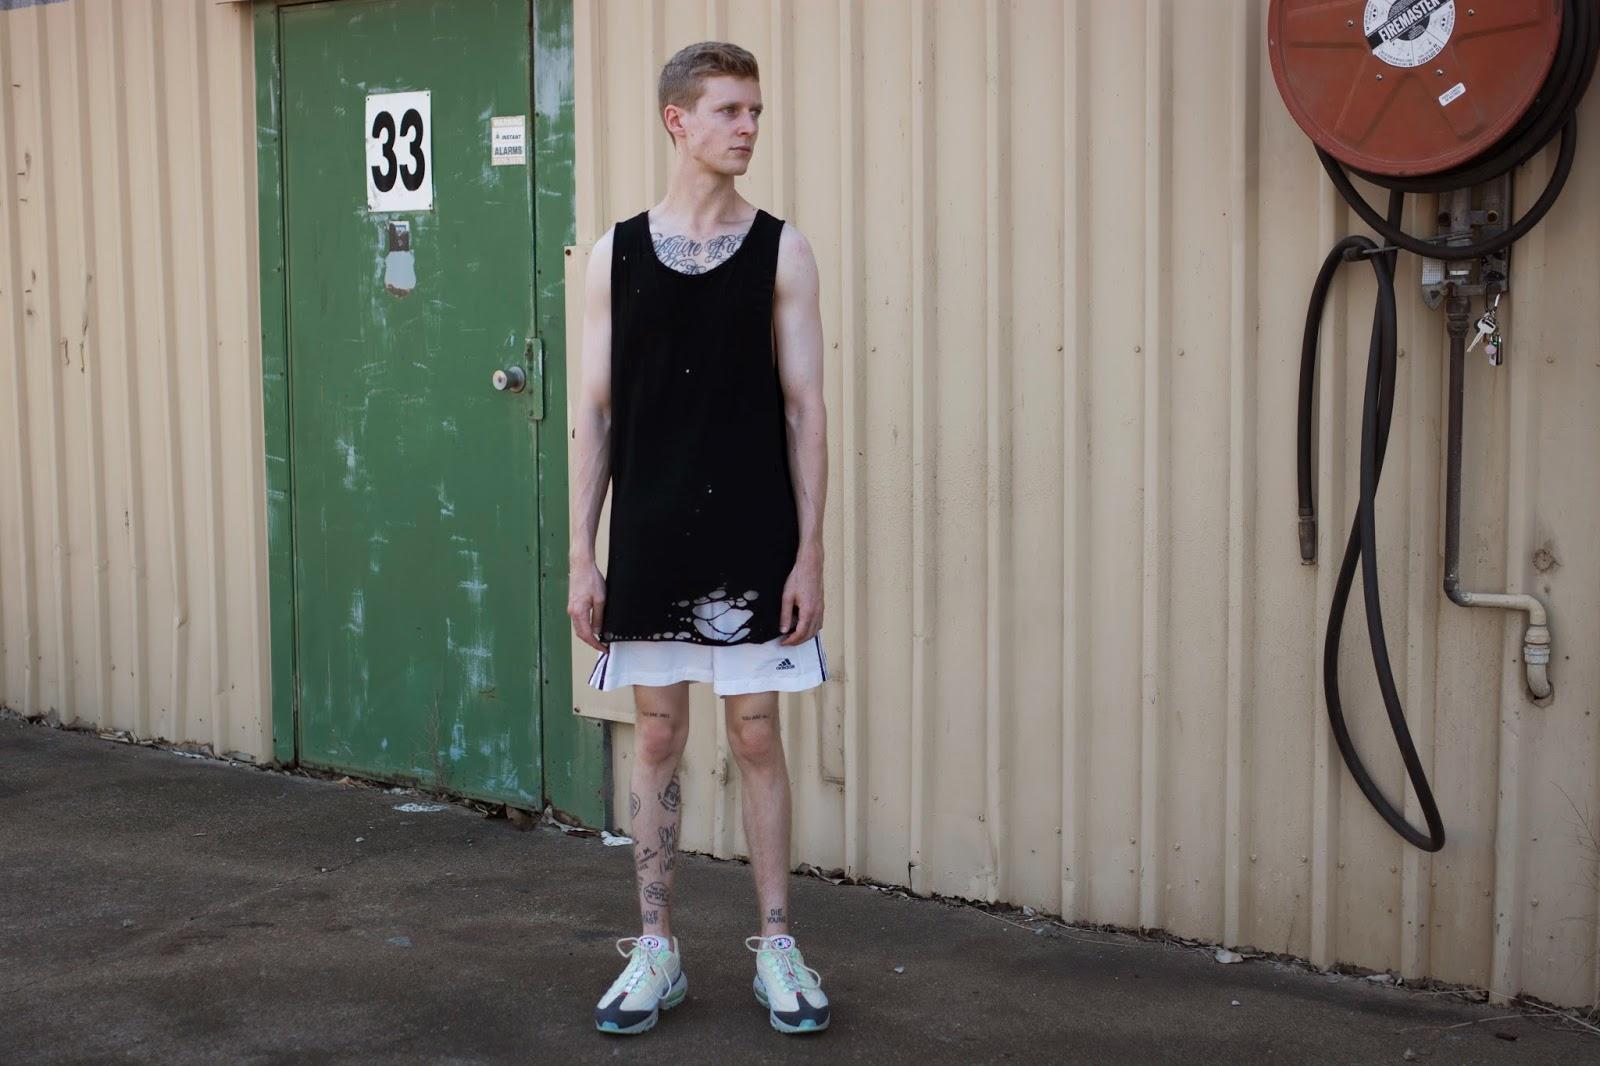 nike air max 95 with shorts